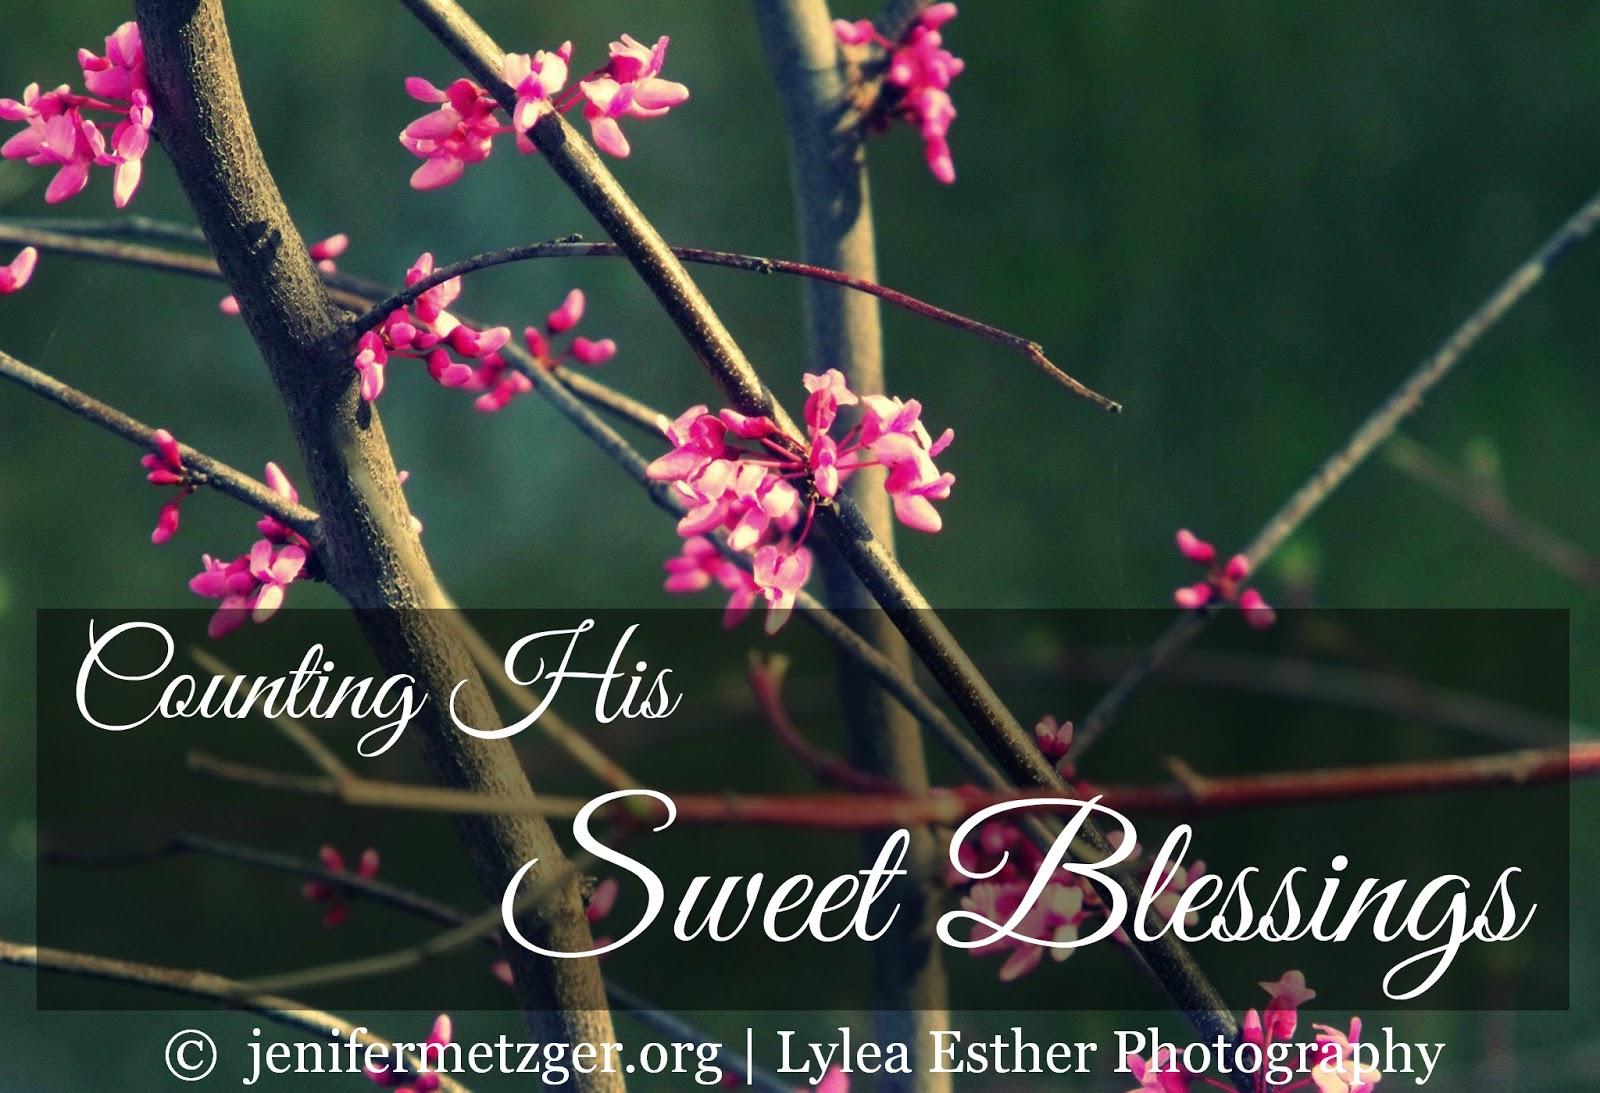 #eucharisteo, #joydare, #thanksgiving, #thankfulness, #1000gifts, #NewYear's,